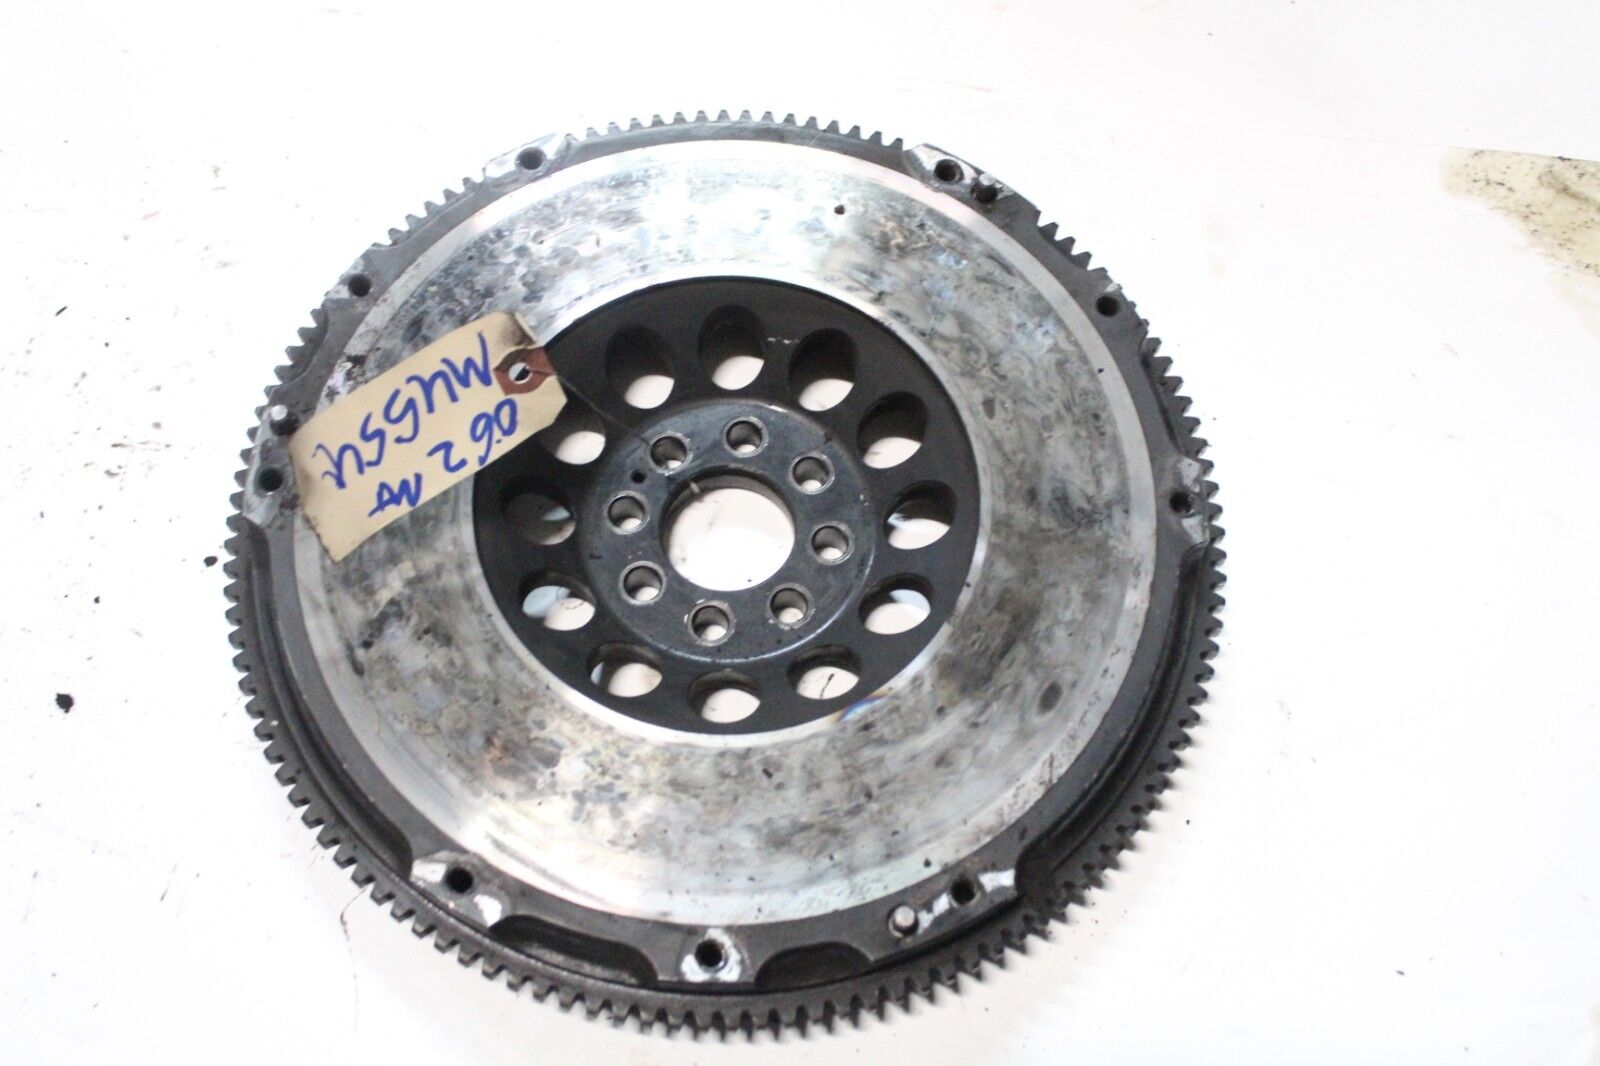 Used 2006 Nissan 350Z Flywheels, Flexplates, & Parts for Sale